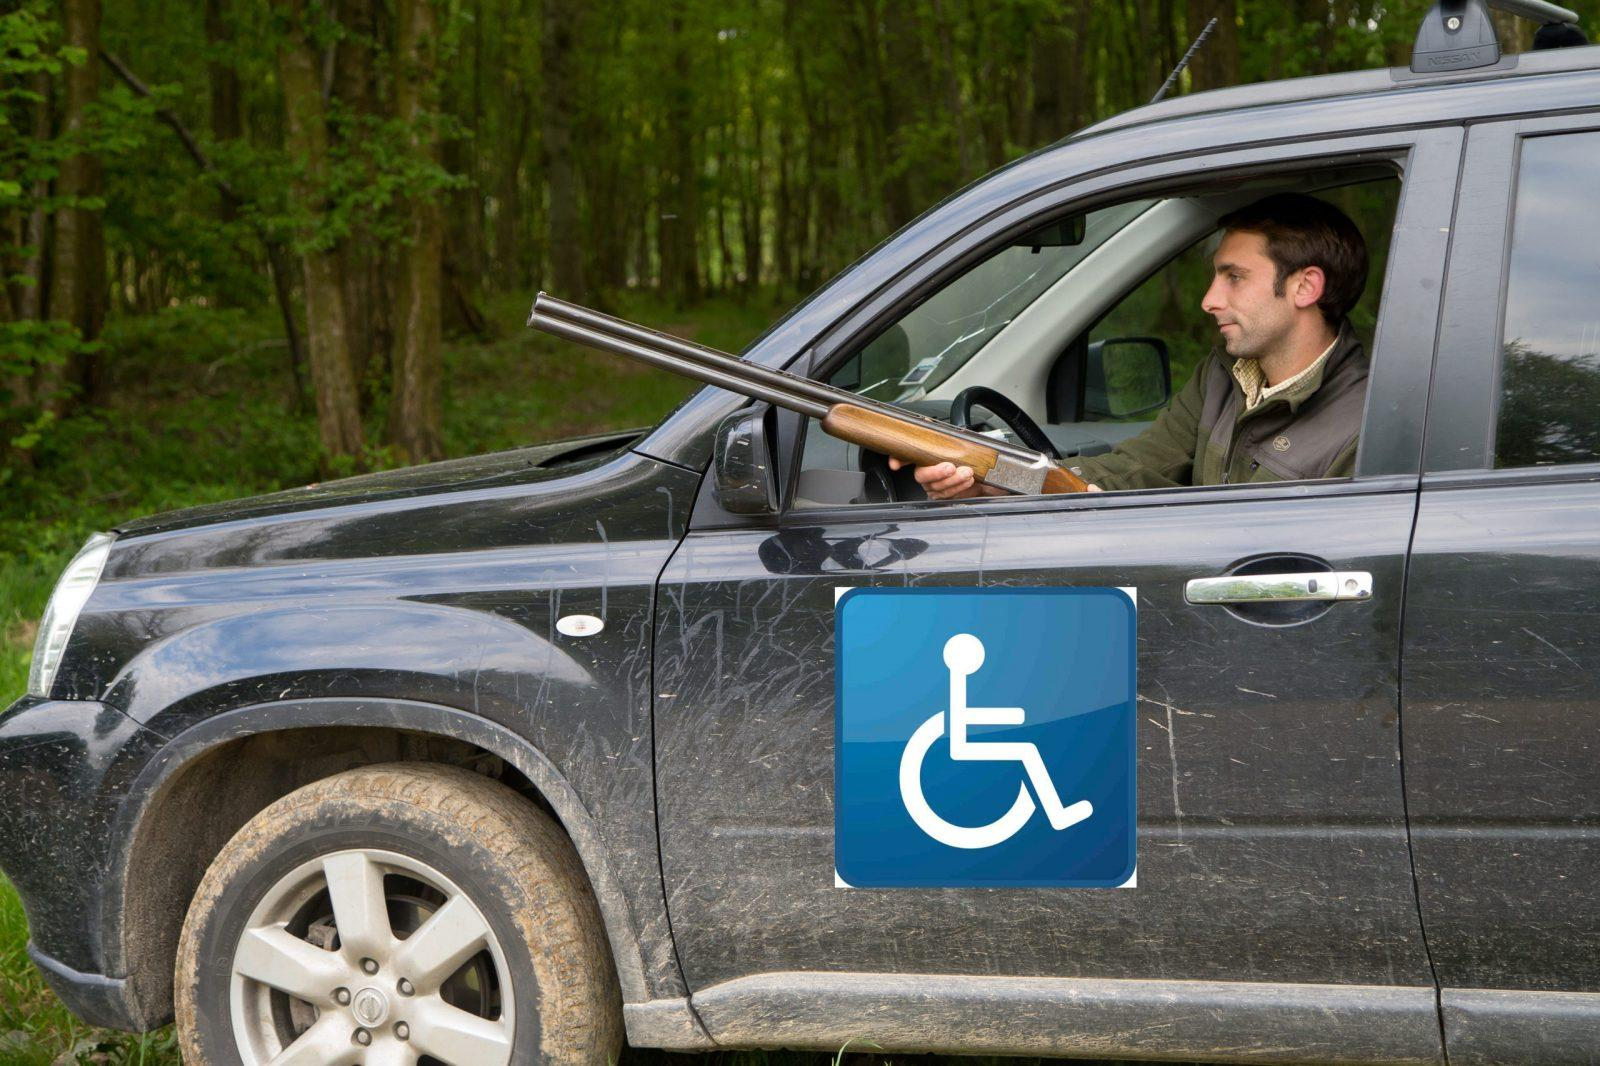 chasse handicap